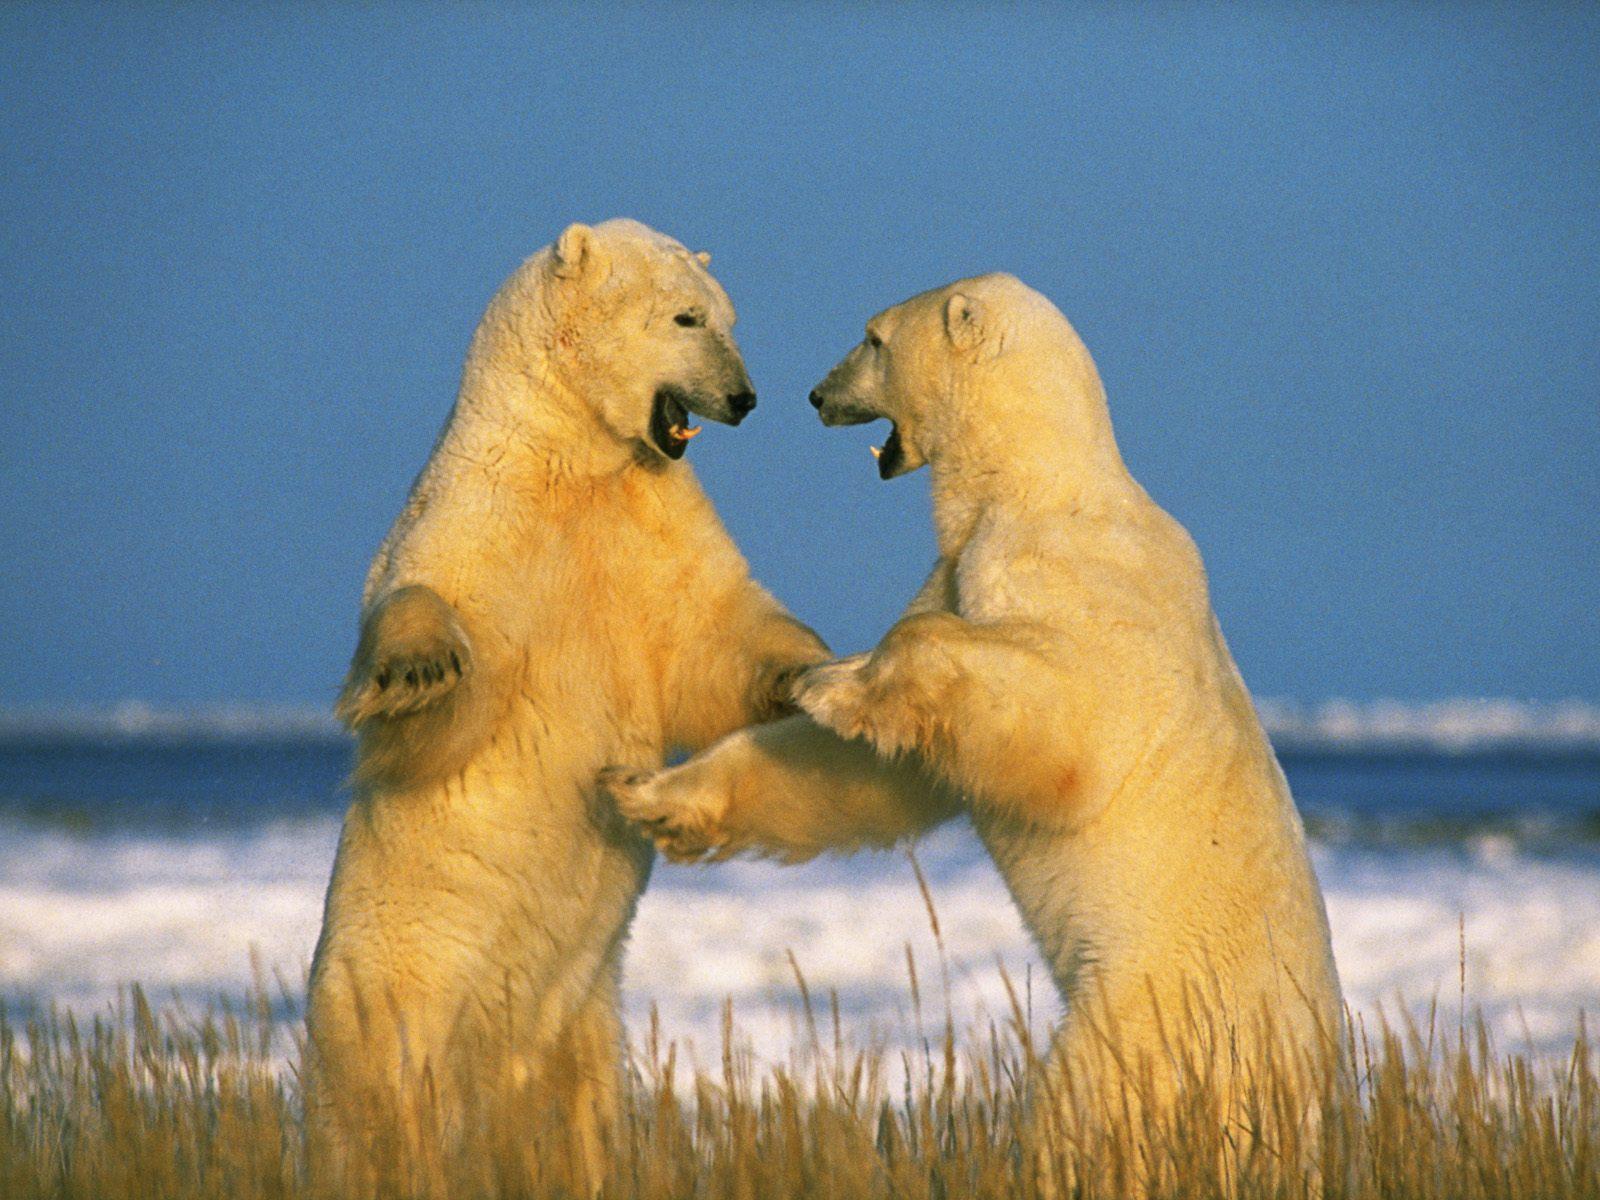 Sparring Polar Bears wallpapers Sparring Polar Bears stock photos 1600x1200